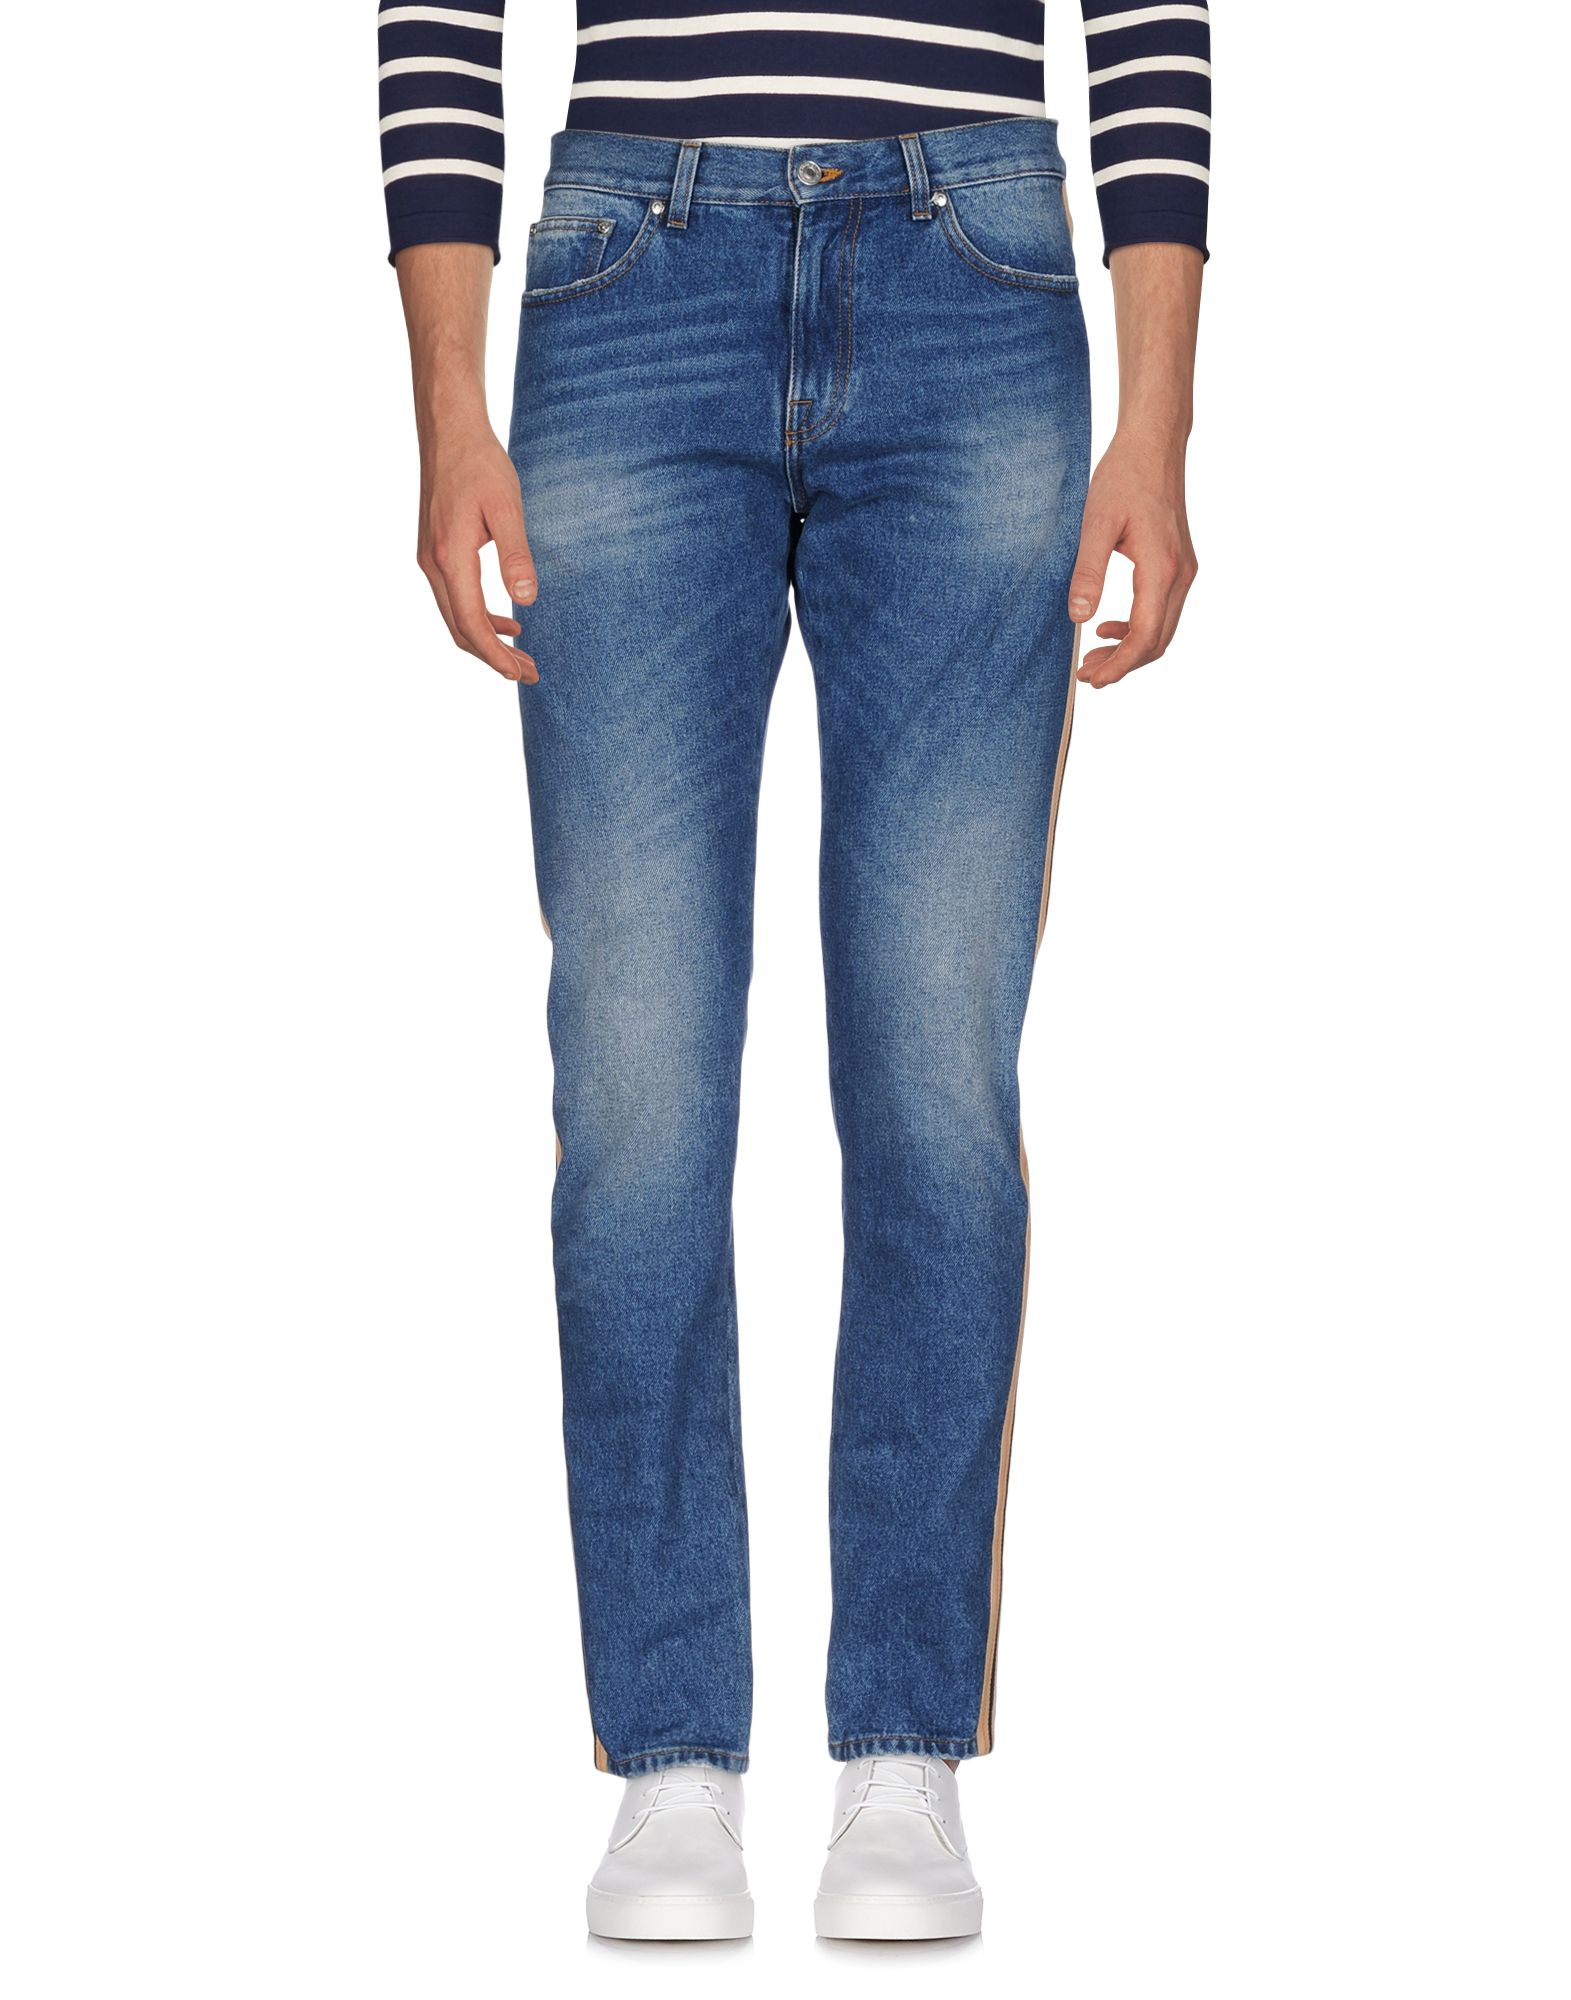 Pantaloni Jeans Msgm Uomo - Acquista online su